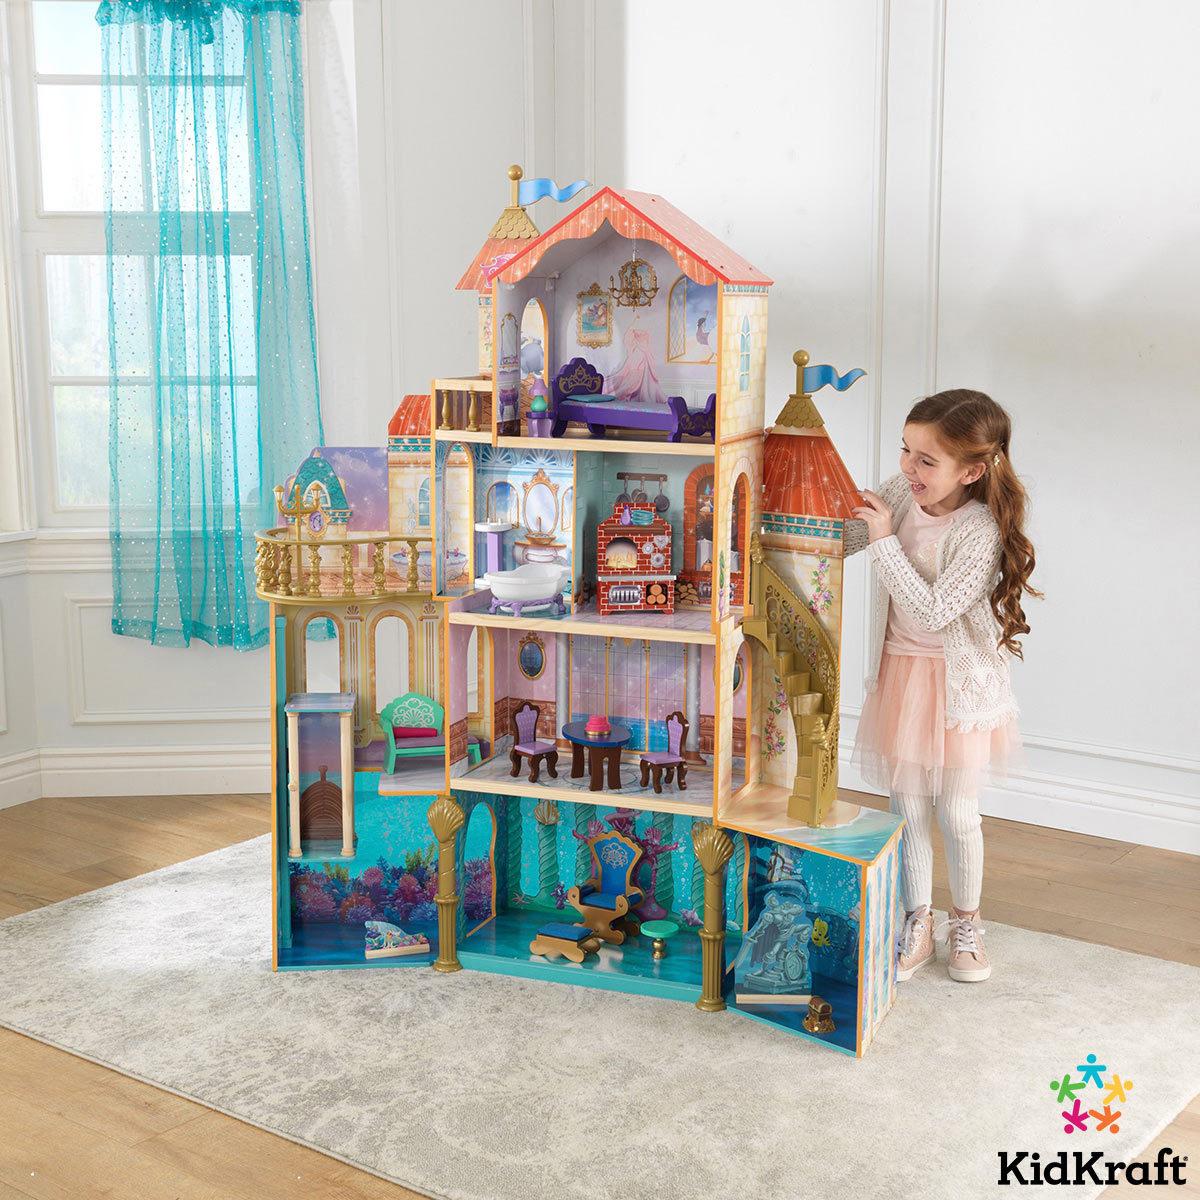 KidKraft Disney® Princess Ariel Undersea Kingdom 5ft Dollhouse + 20 Pieces of Furniture £129.89 @ Costco